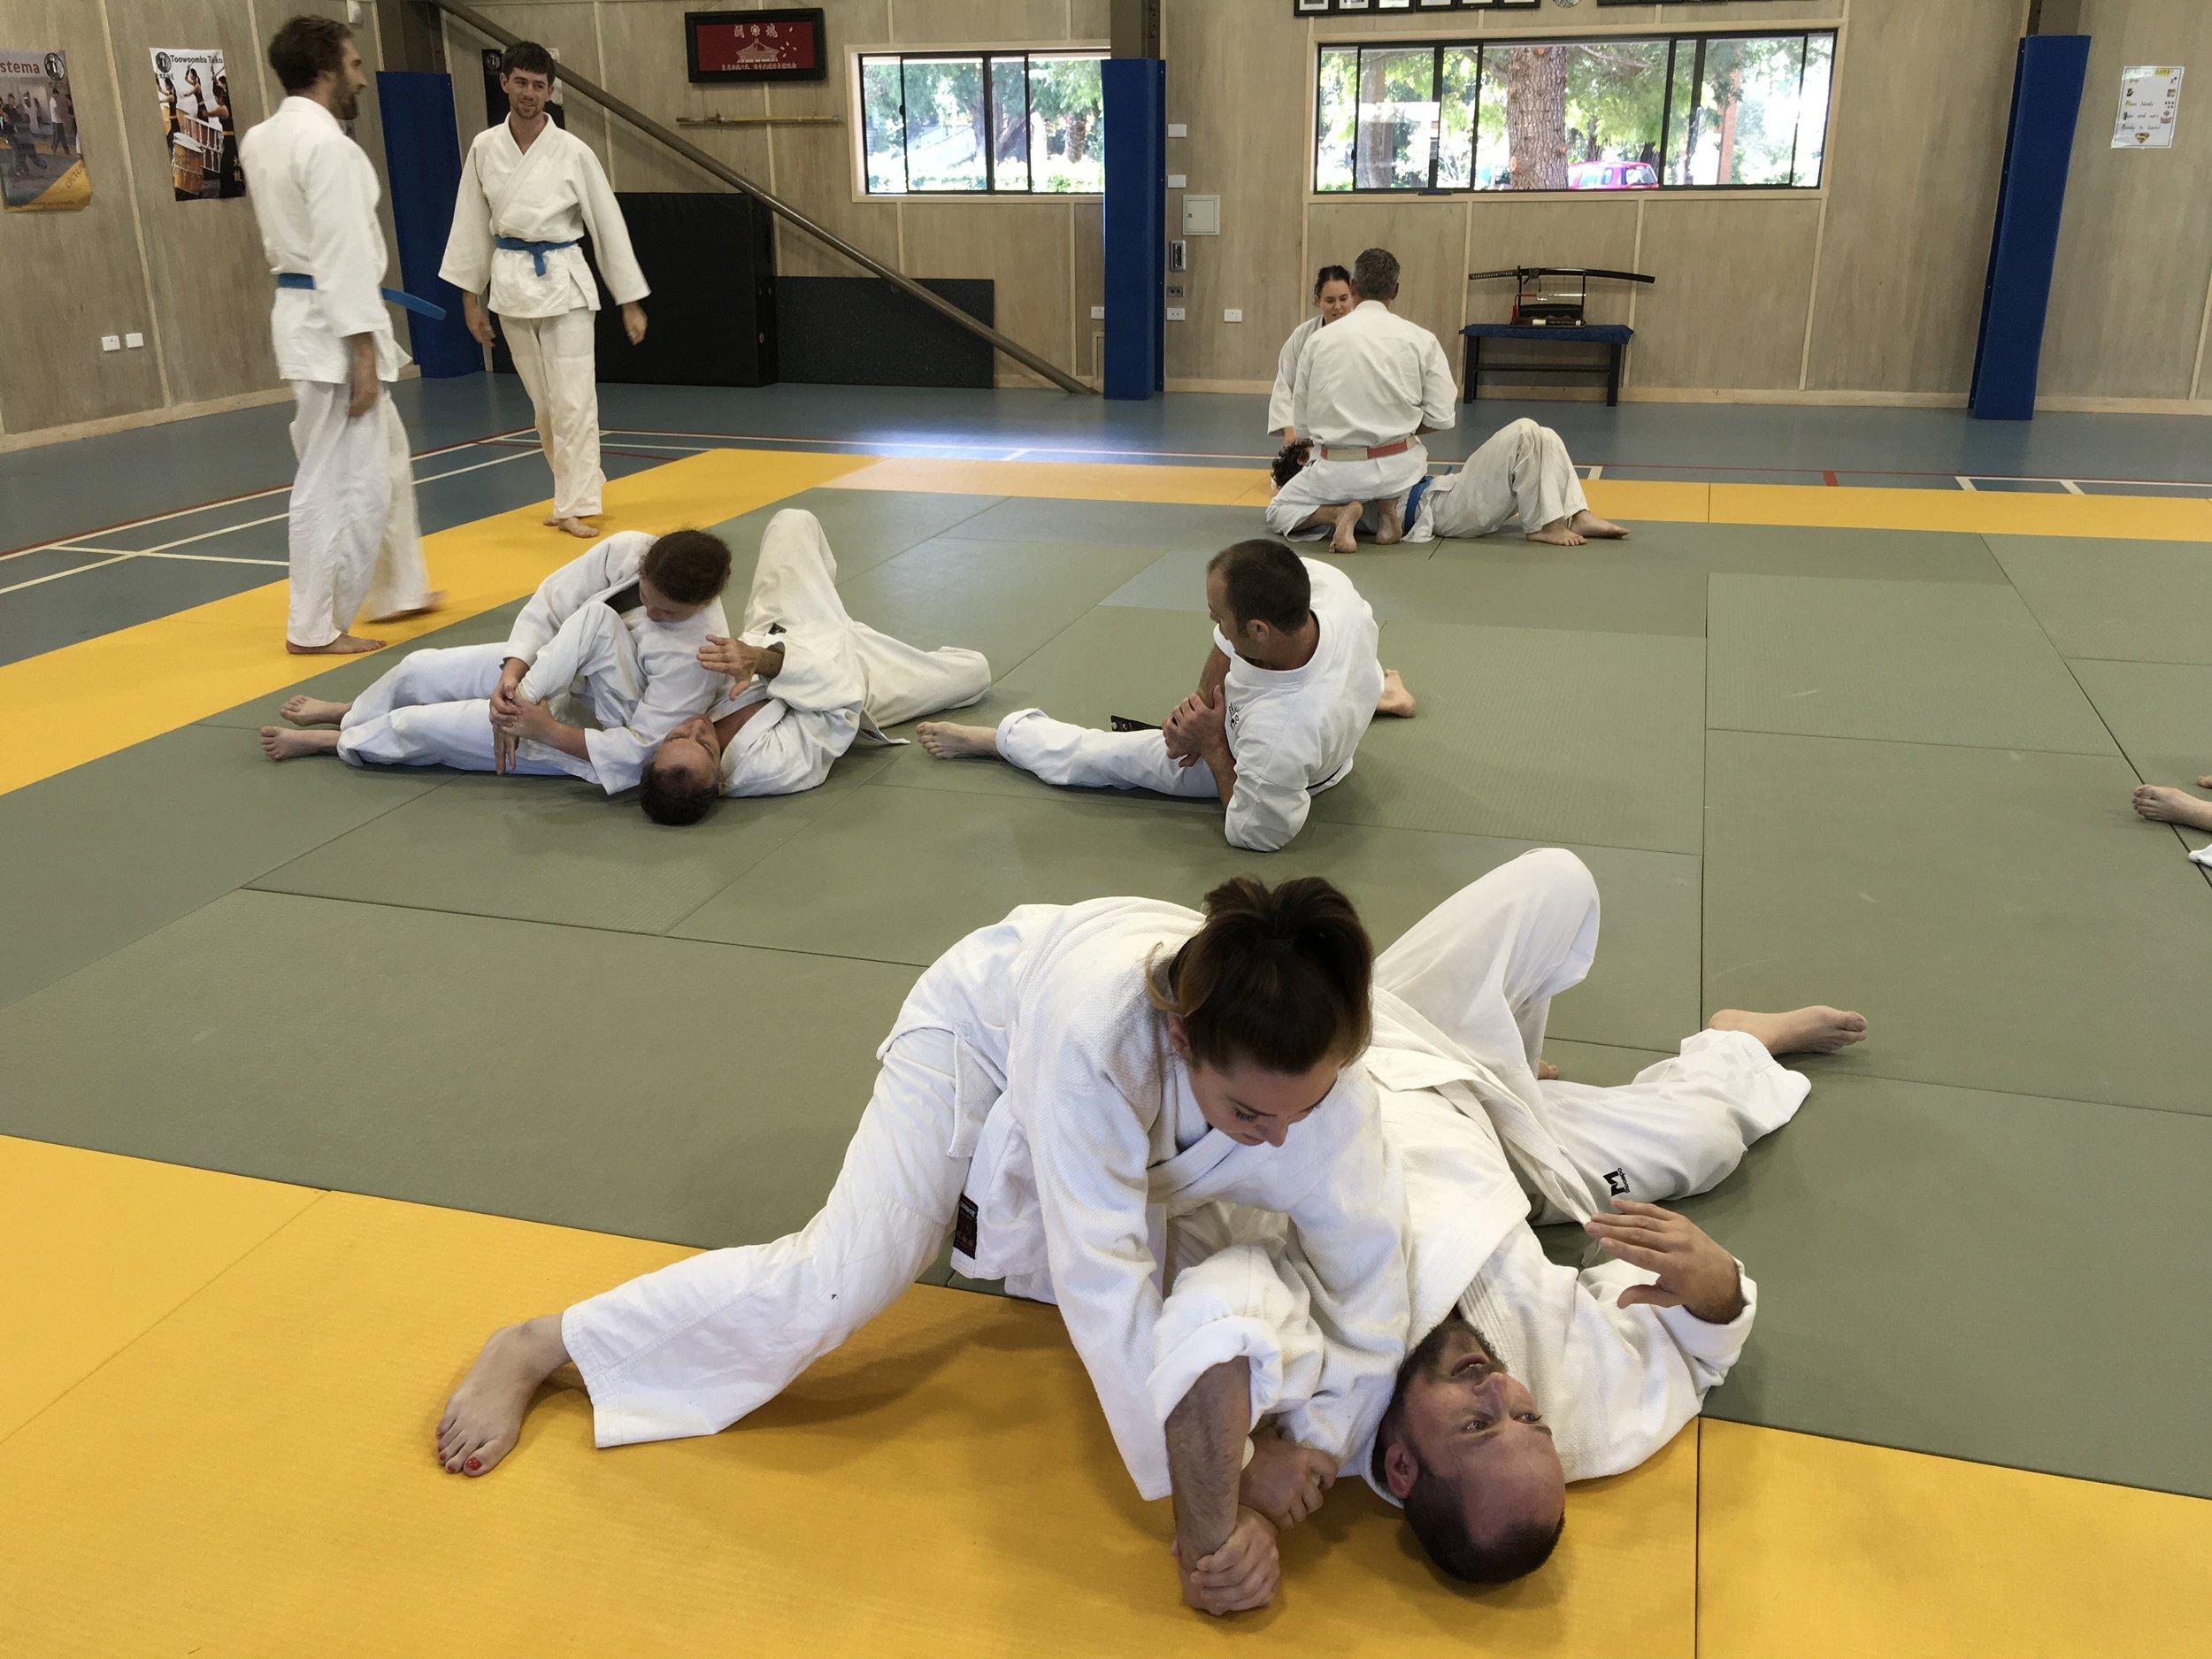 Kesa drill during the Jujutsu session